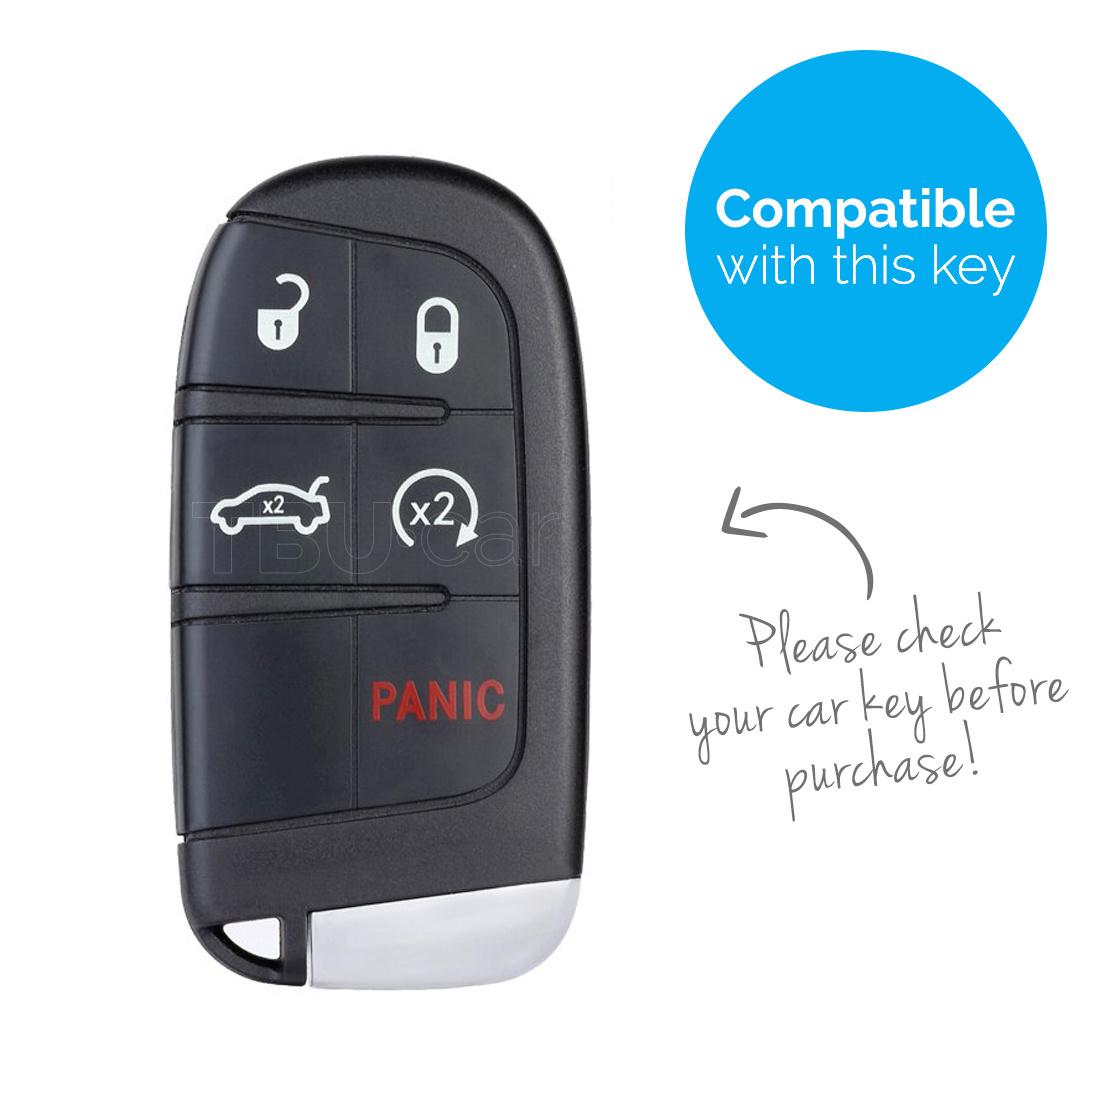 TBU car TBU car Autoschlüssel Hülle kompatibel mit Fiat 5 Tasten (Keyless Entry) - Schutzhülle aus TPU - Auto Schlüsselhülle Cover in Silber Chrom